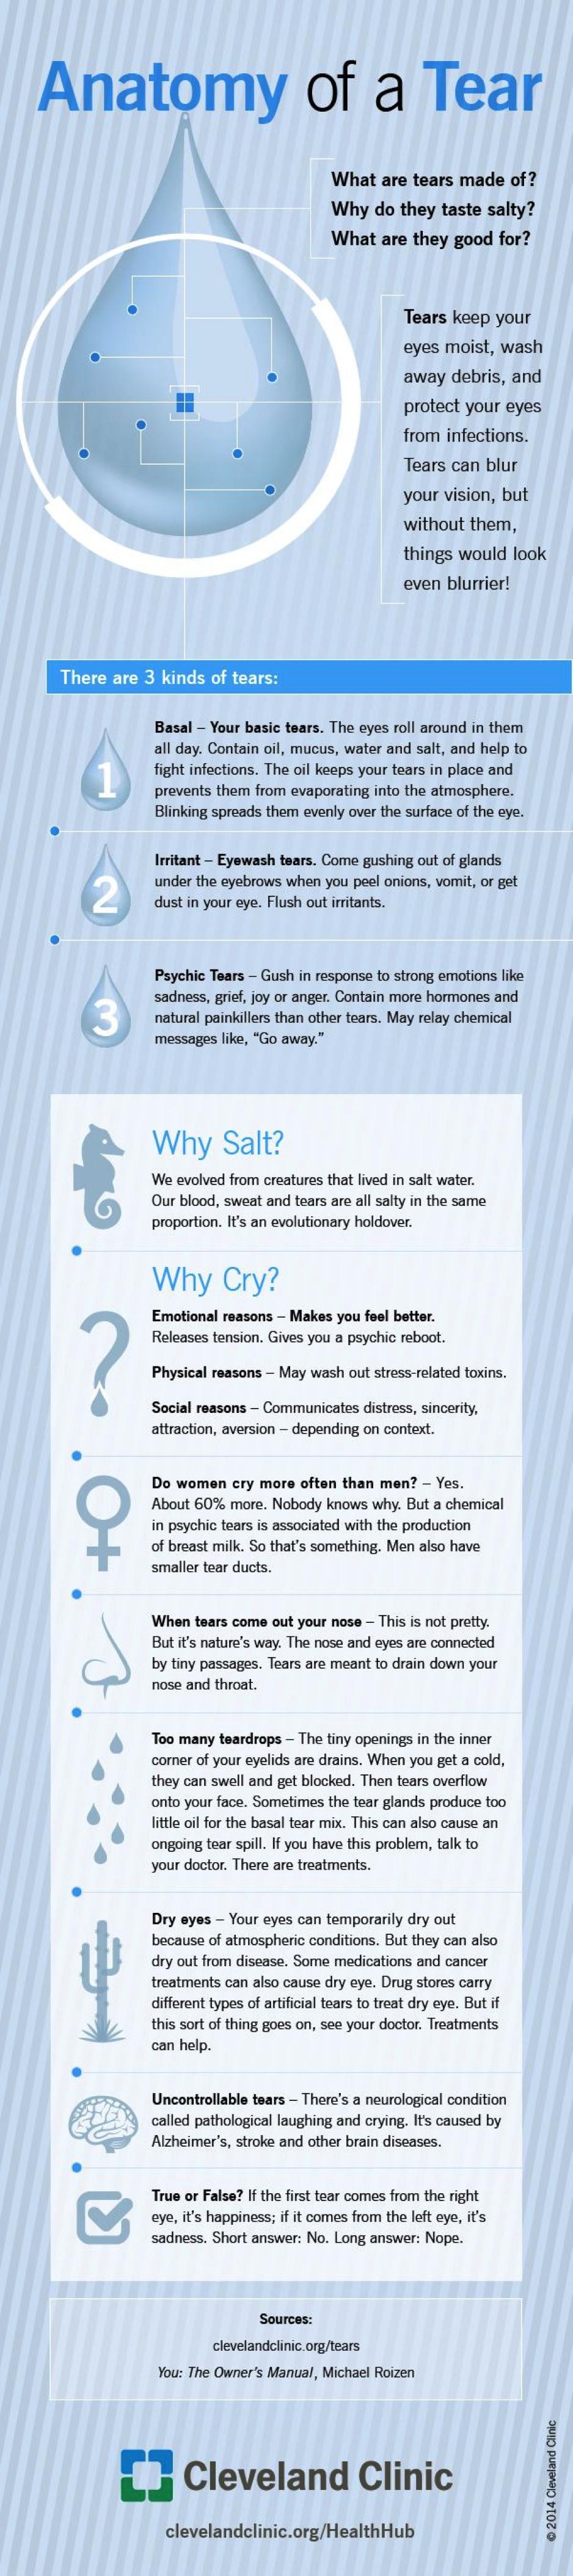 Anatomy of a Tear